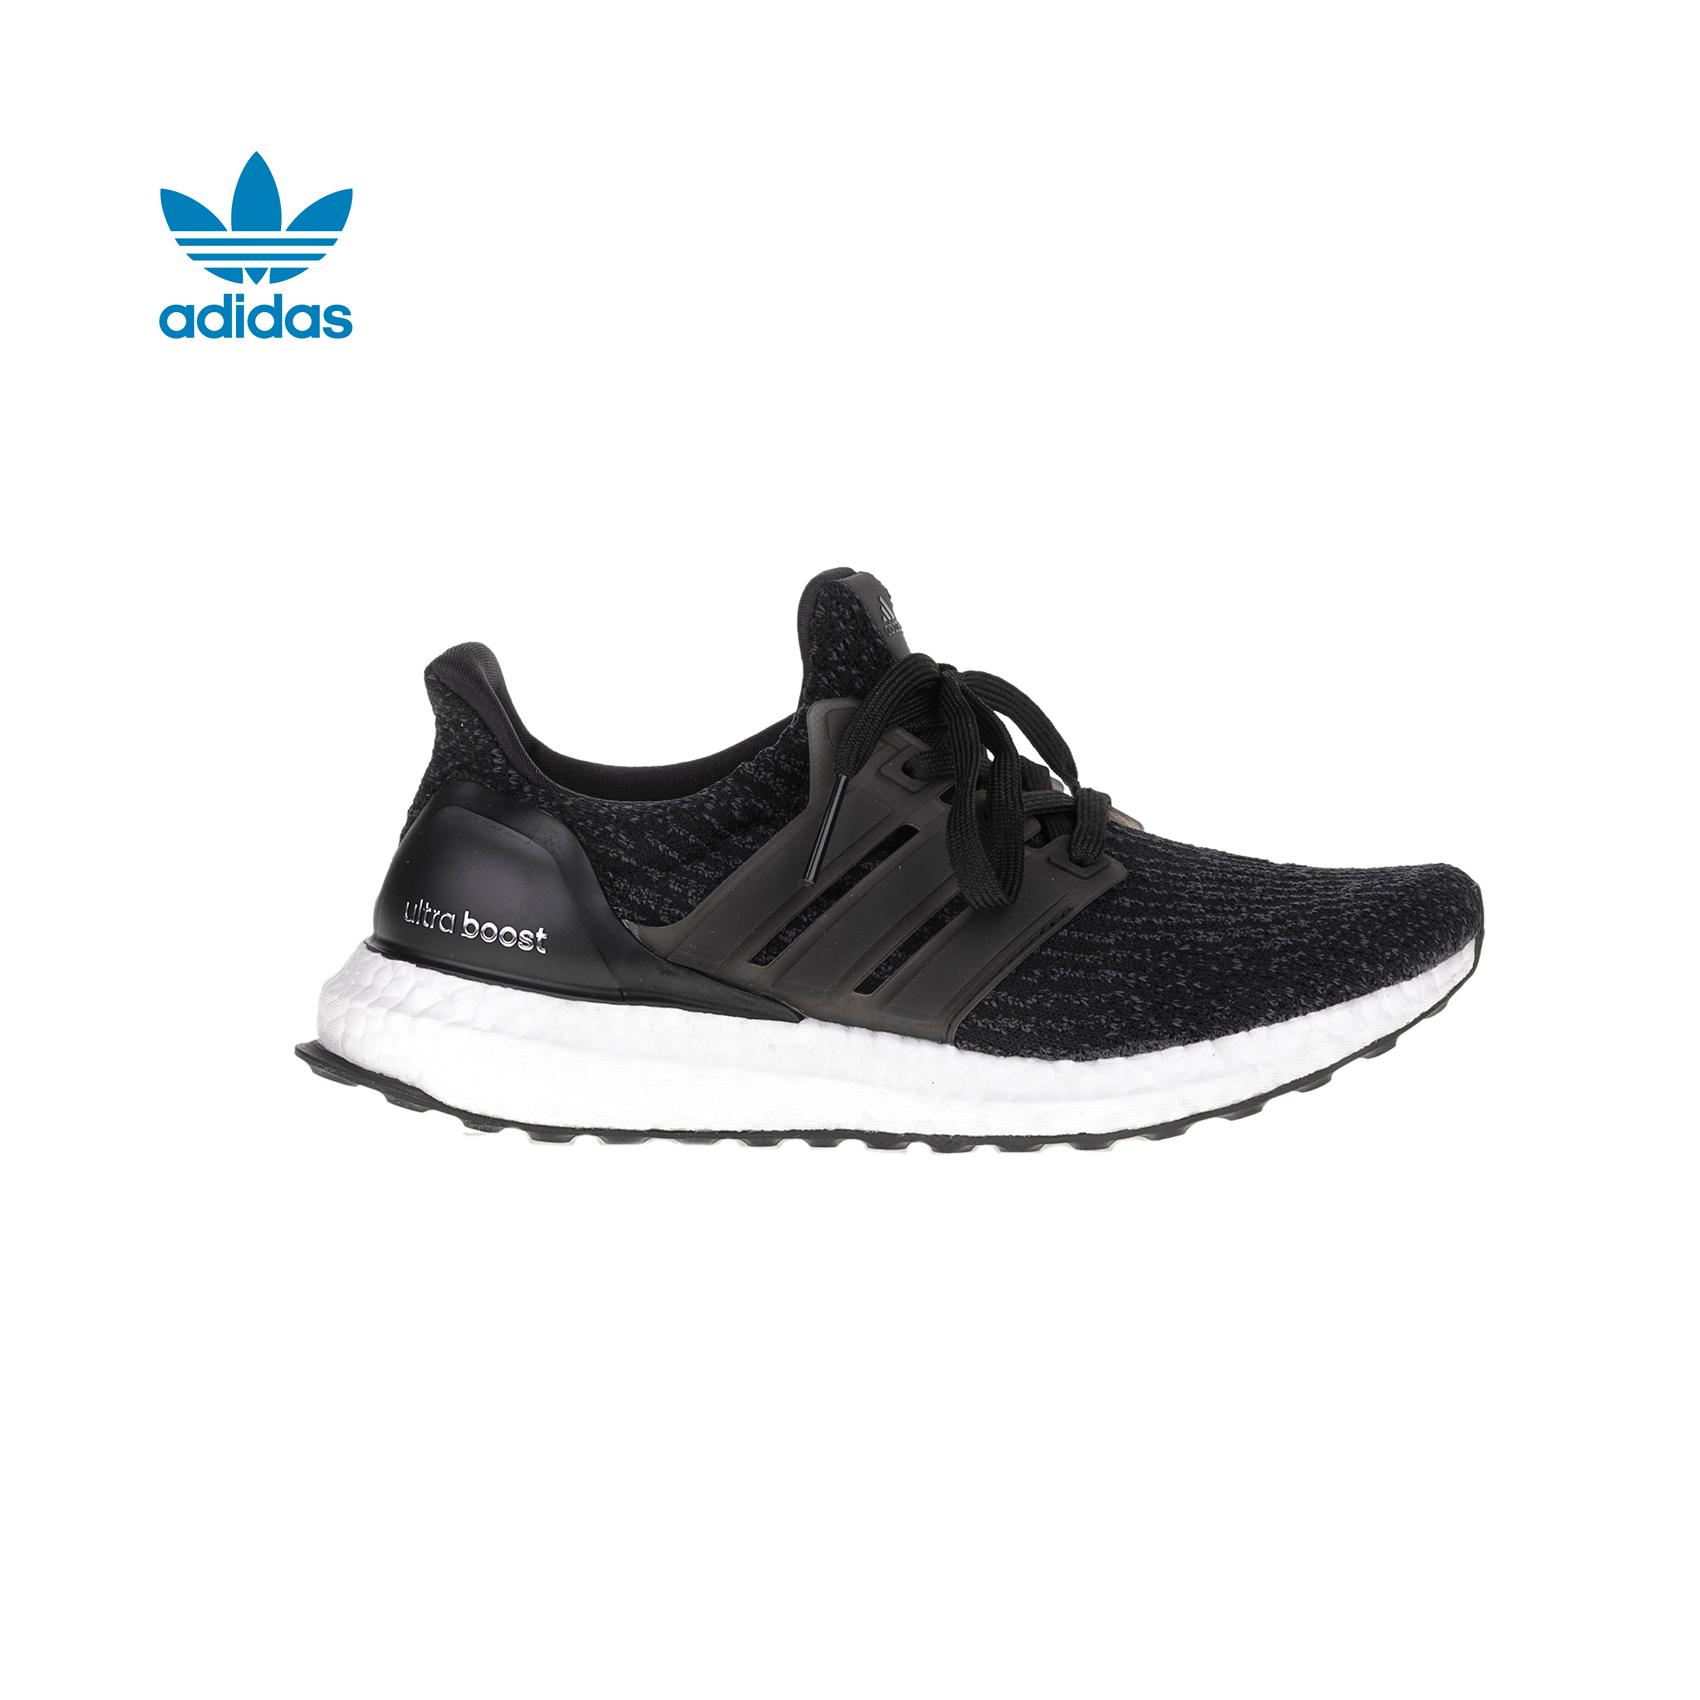 adidas Originals – Γυναικεία παπούτσια adidas UltraBOOST μαύρα